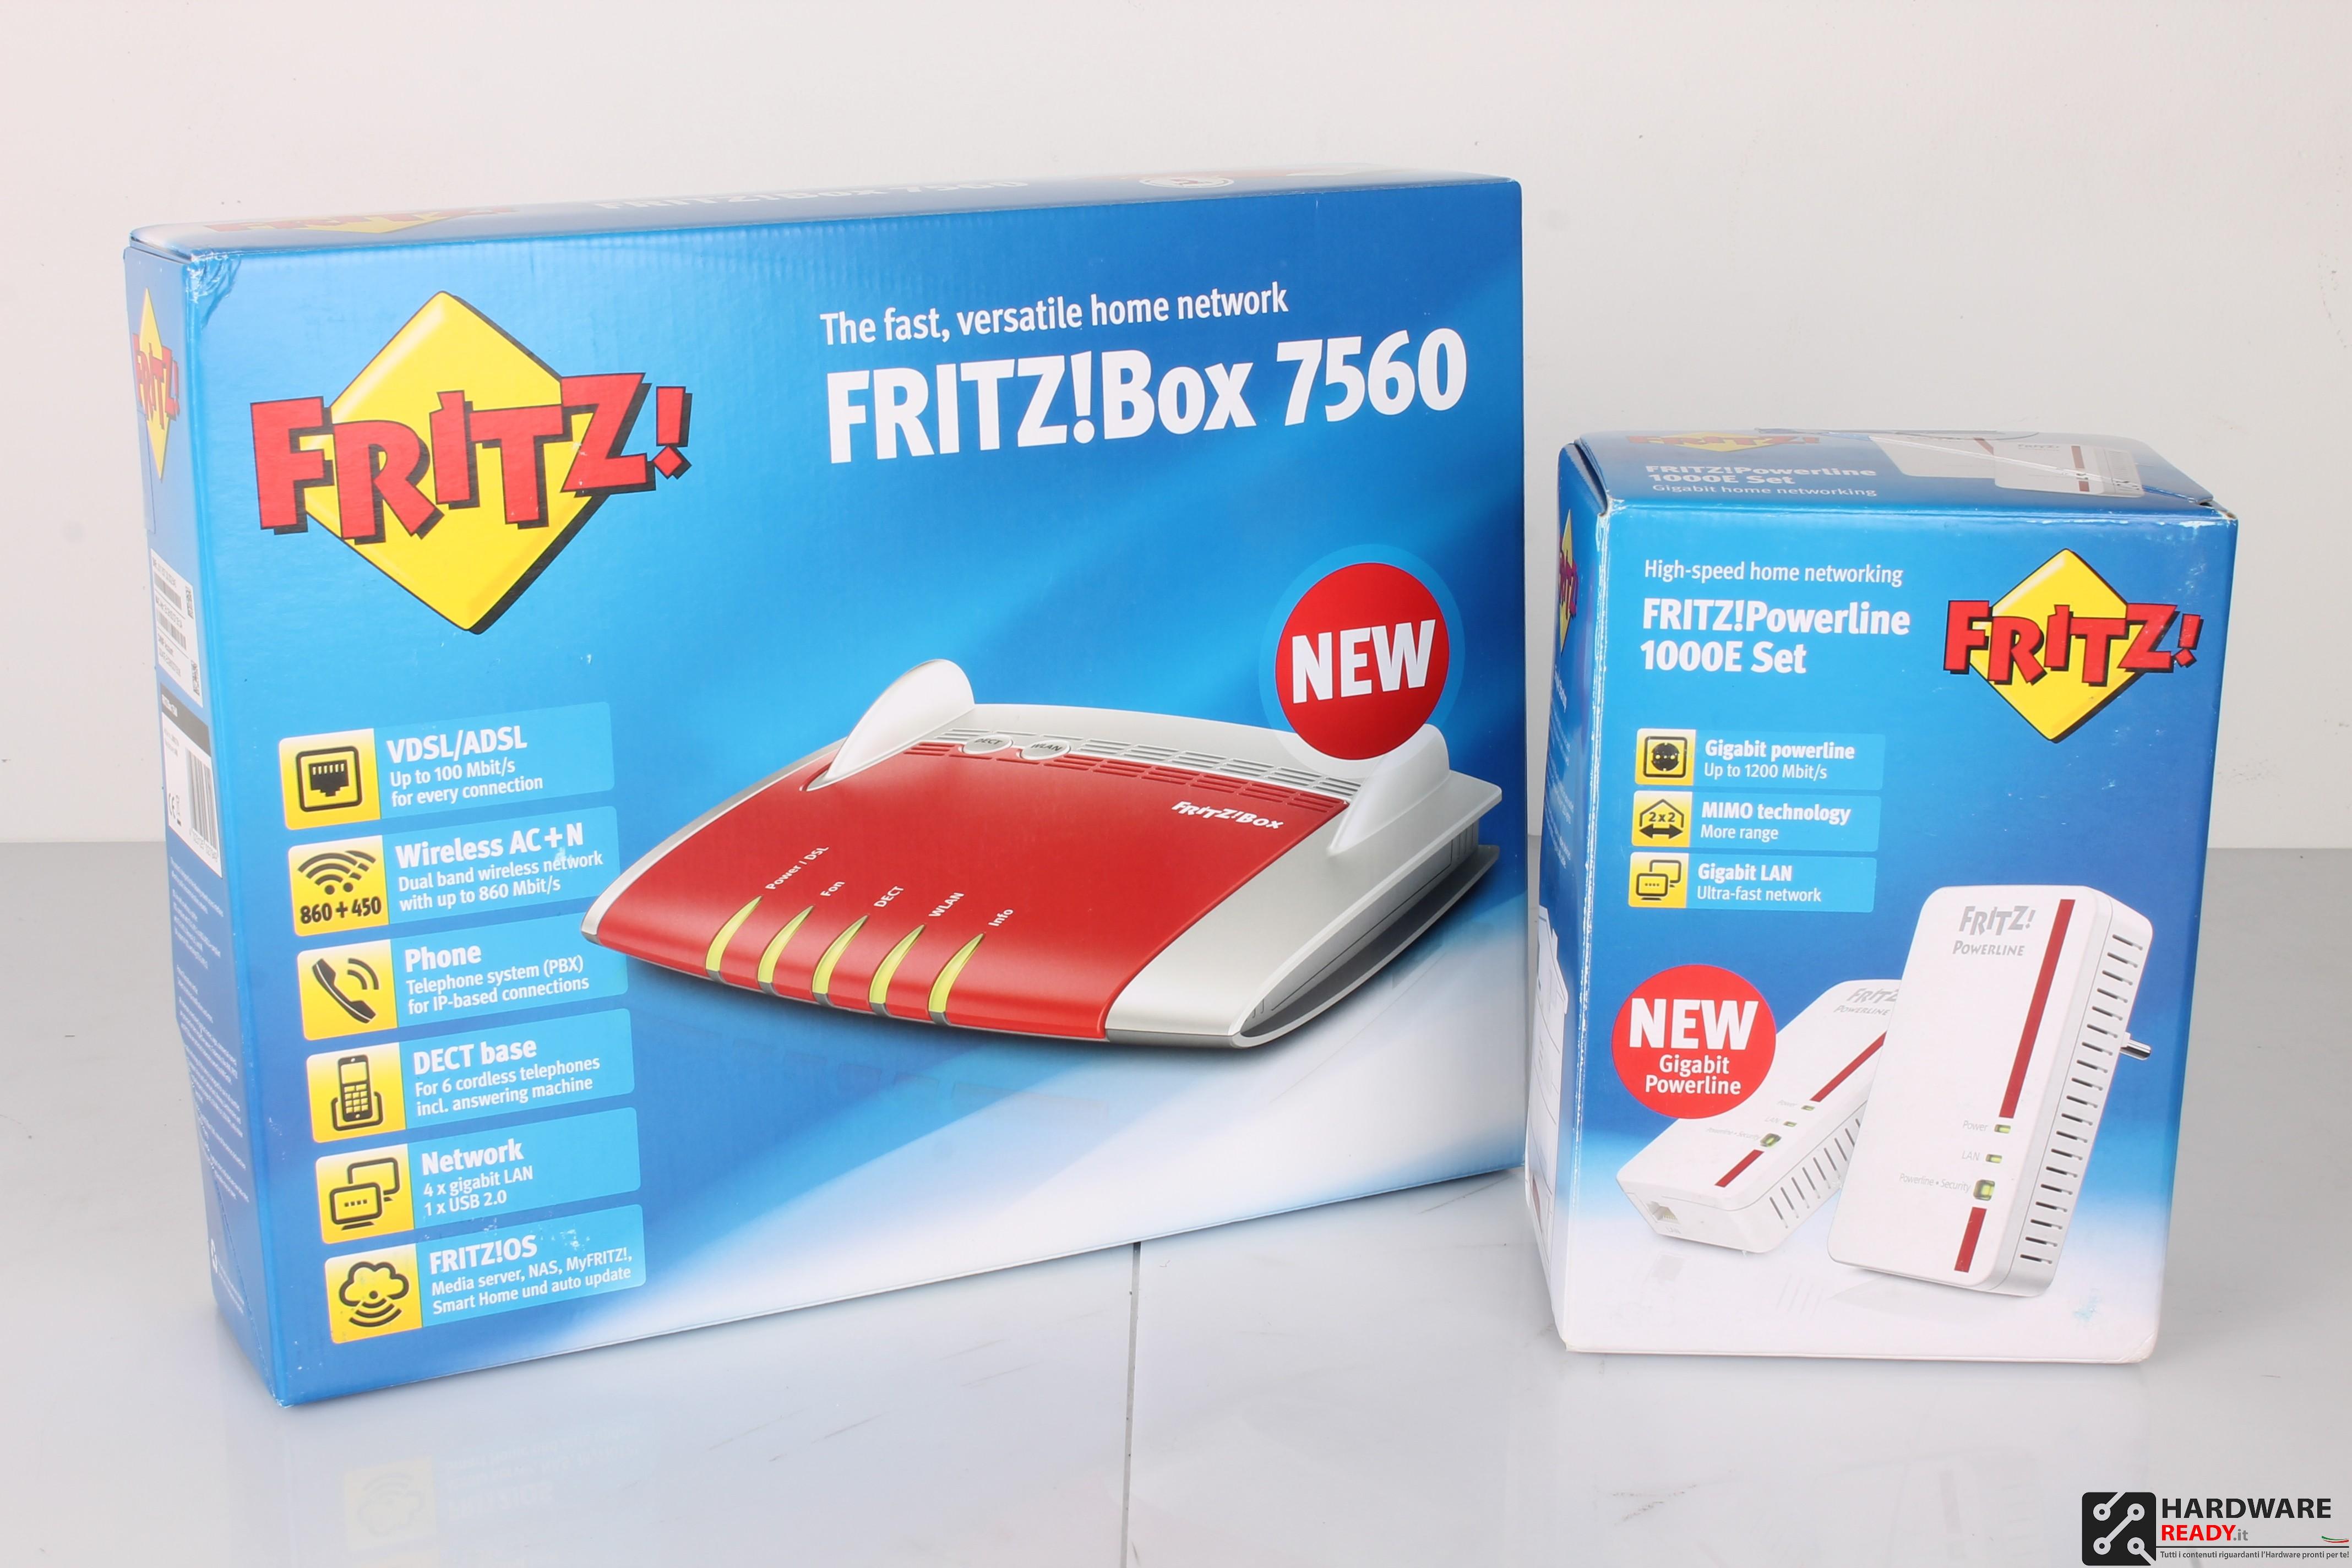 fritz box 7560 recensione hardware ready. Black Bedroom Furniture Sets. Home Design Ideas